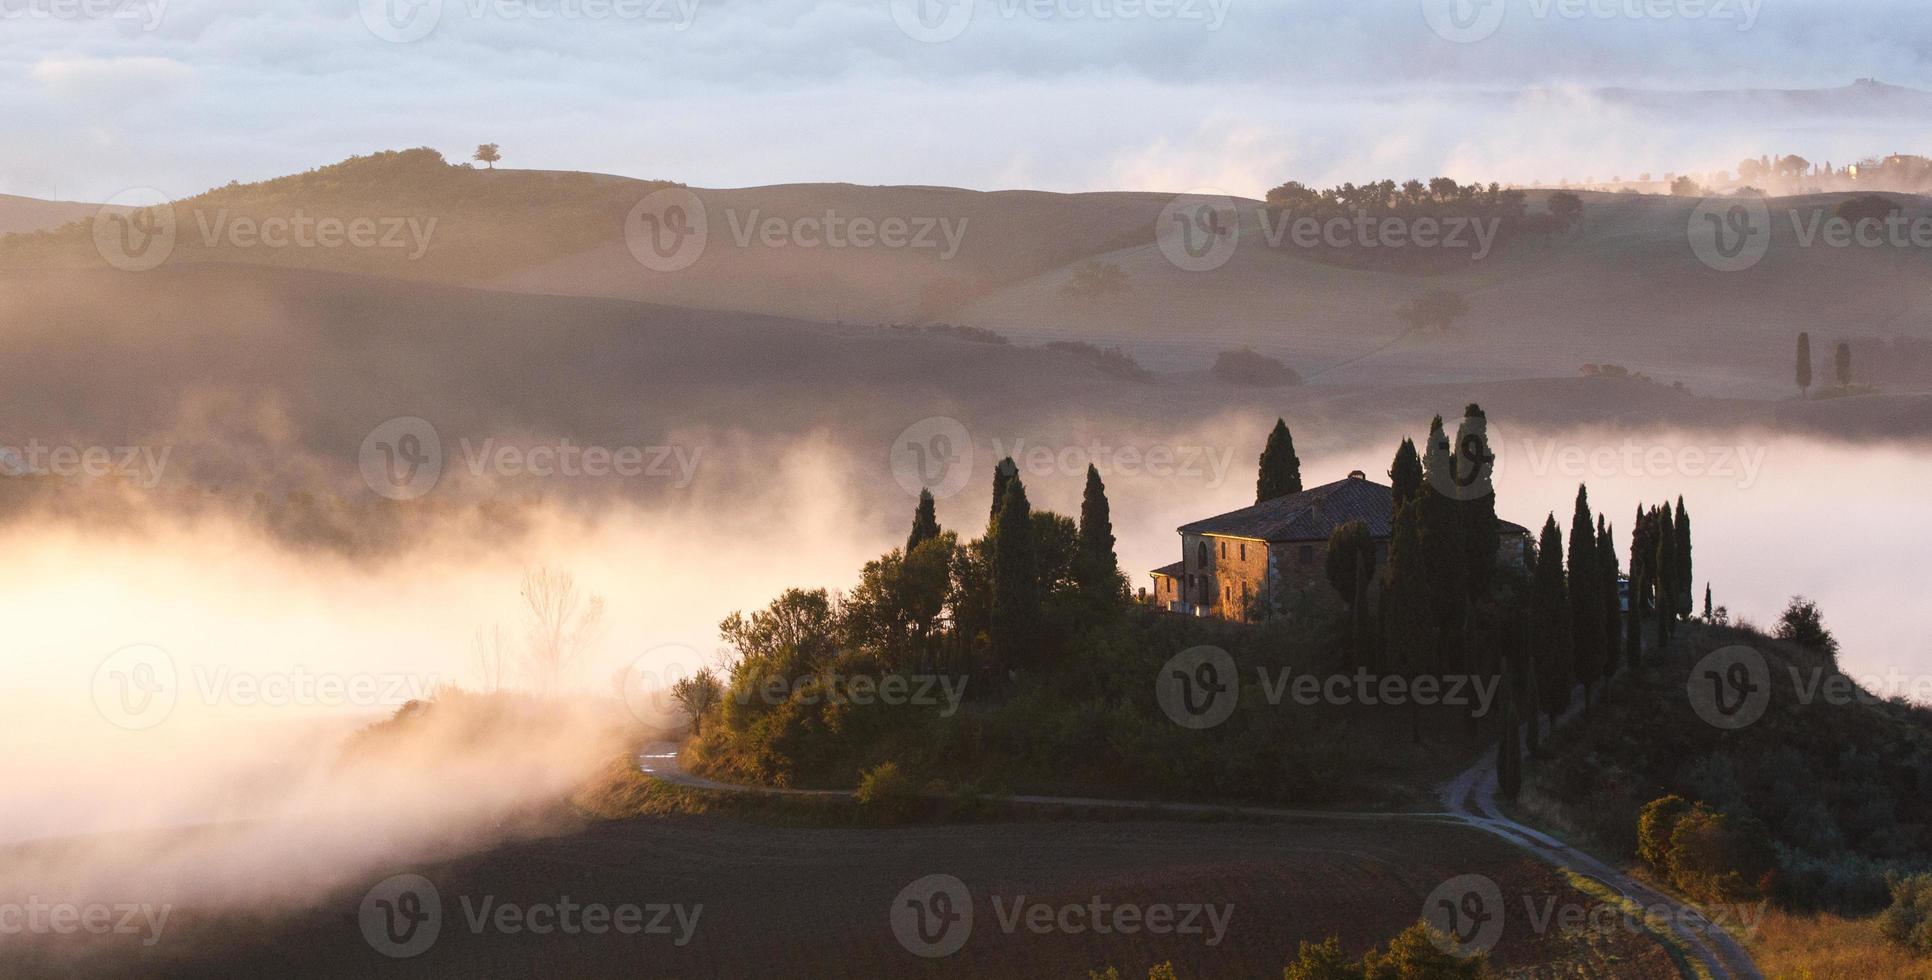 am frühen Morgen mit Nebel in der Toskana, Italien foto